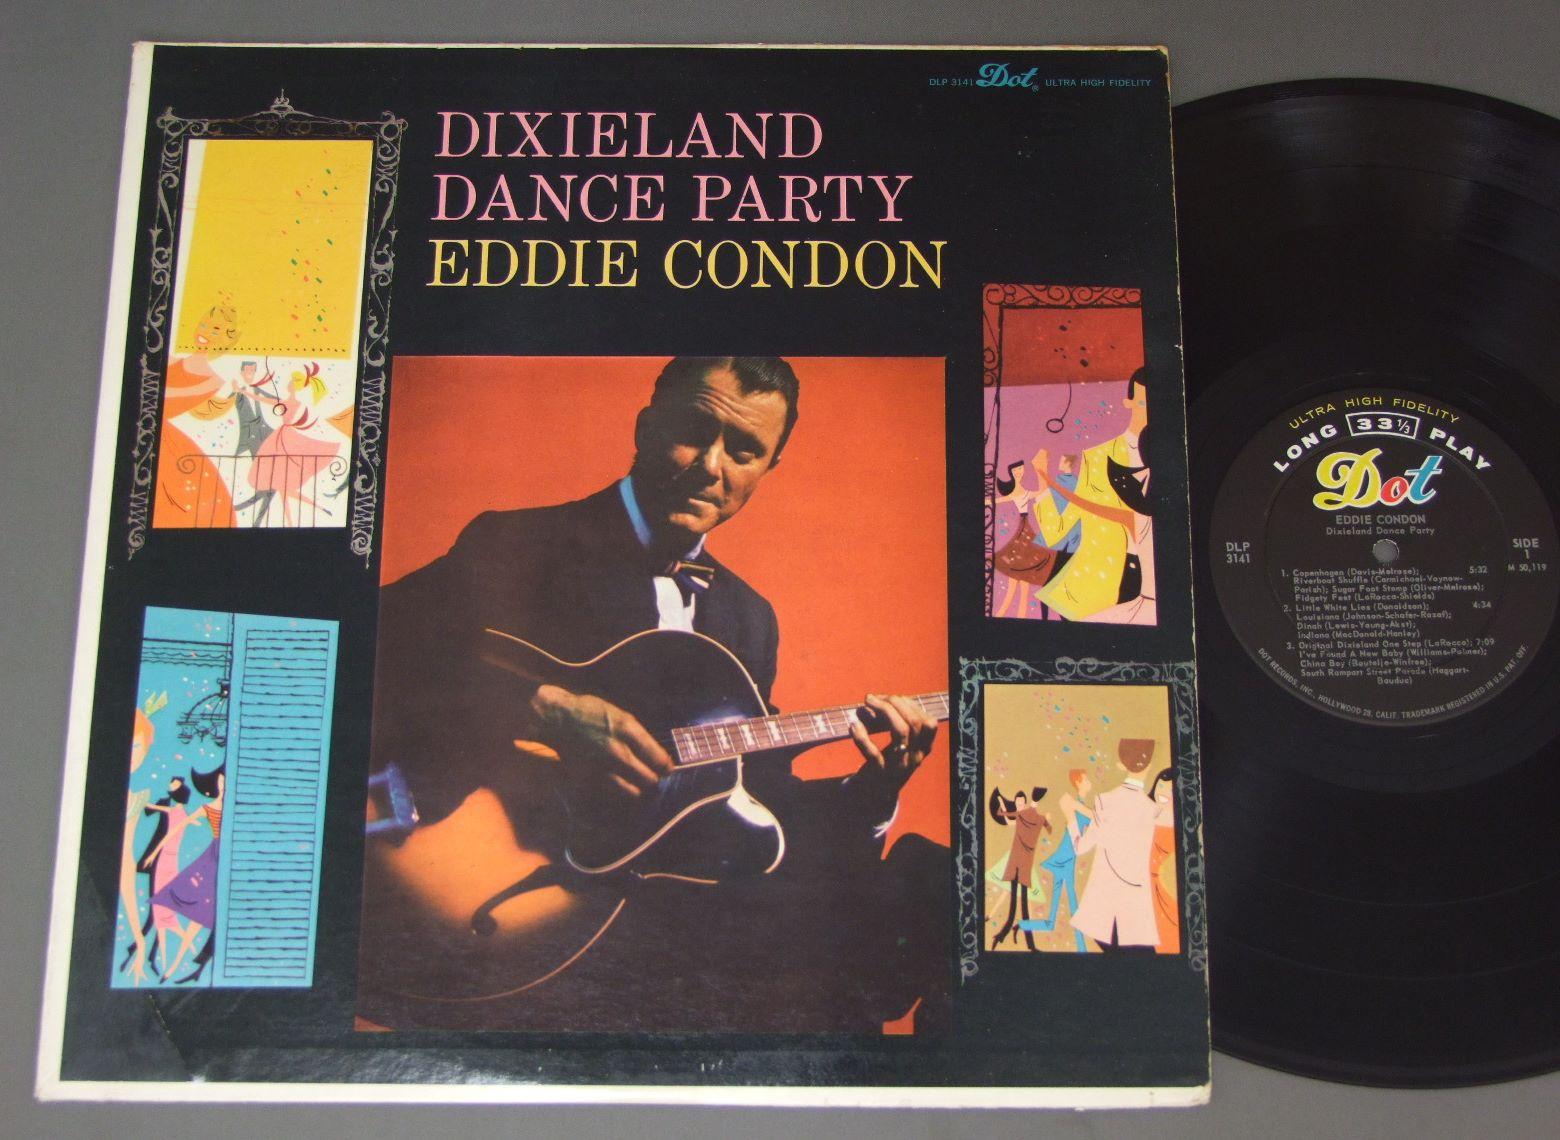 EDDIE CONDON/DIXIELAND DANCE PARTY DLP3141アナログレコード 詳細ページ